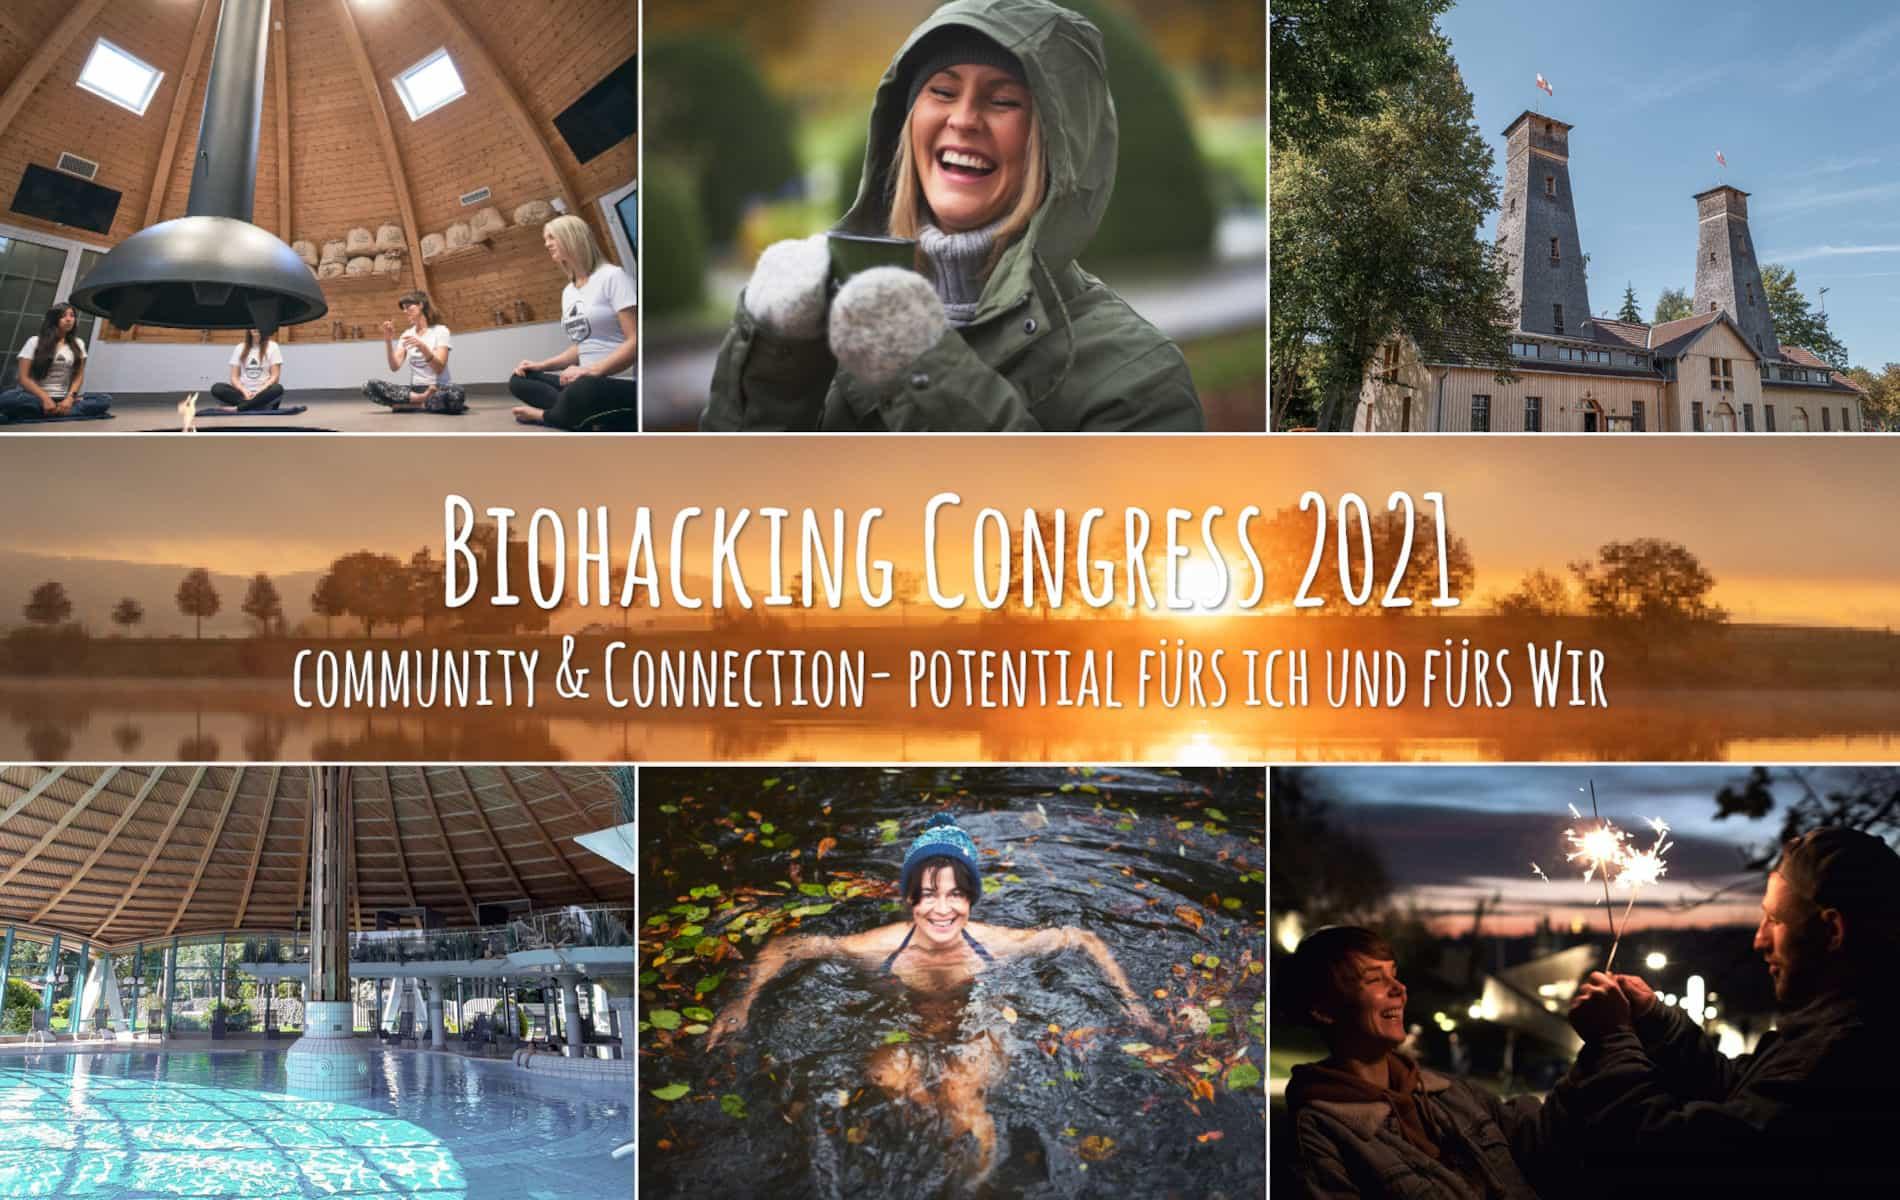 Biohacking Congress 2021 - Biohacking Bad Dürrheim